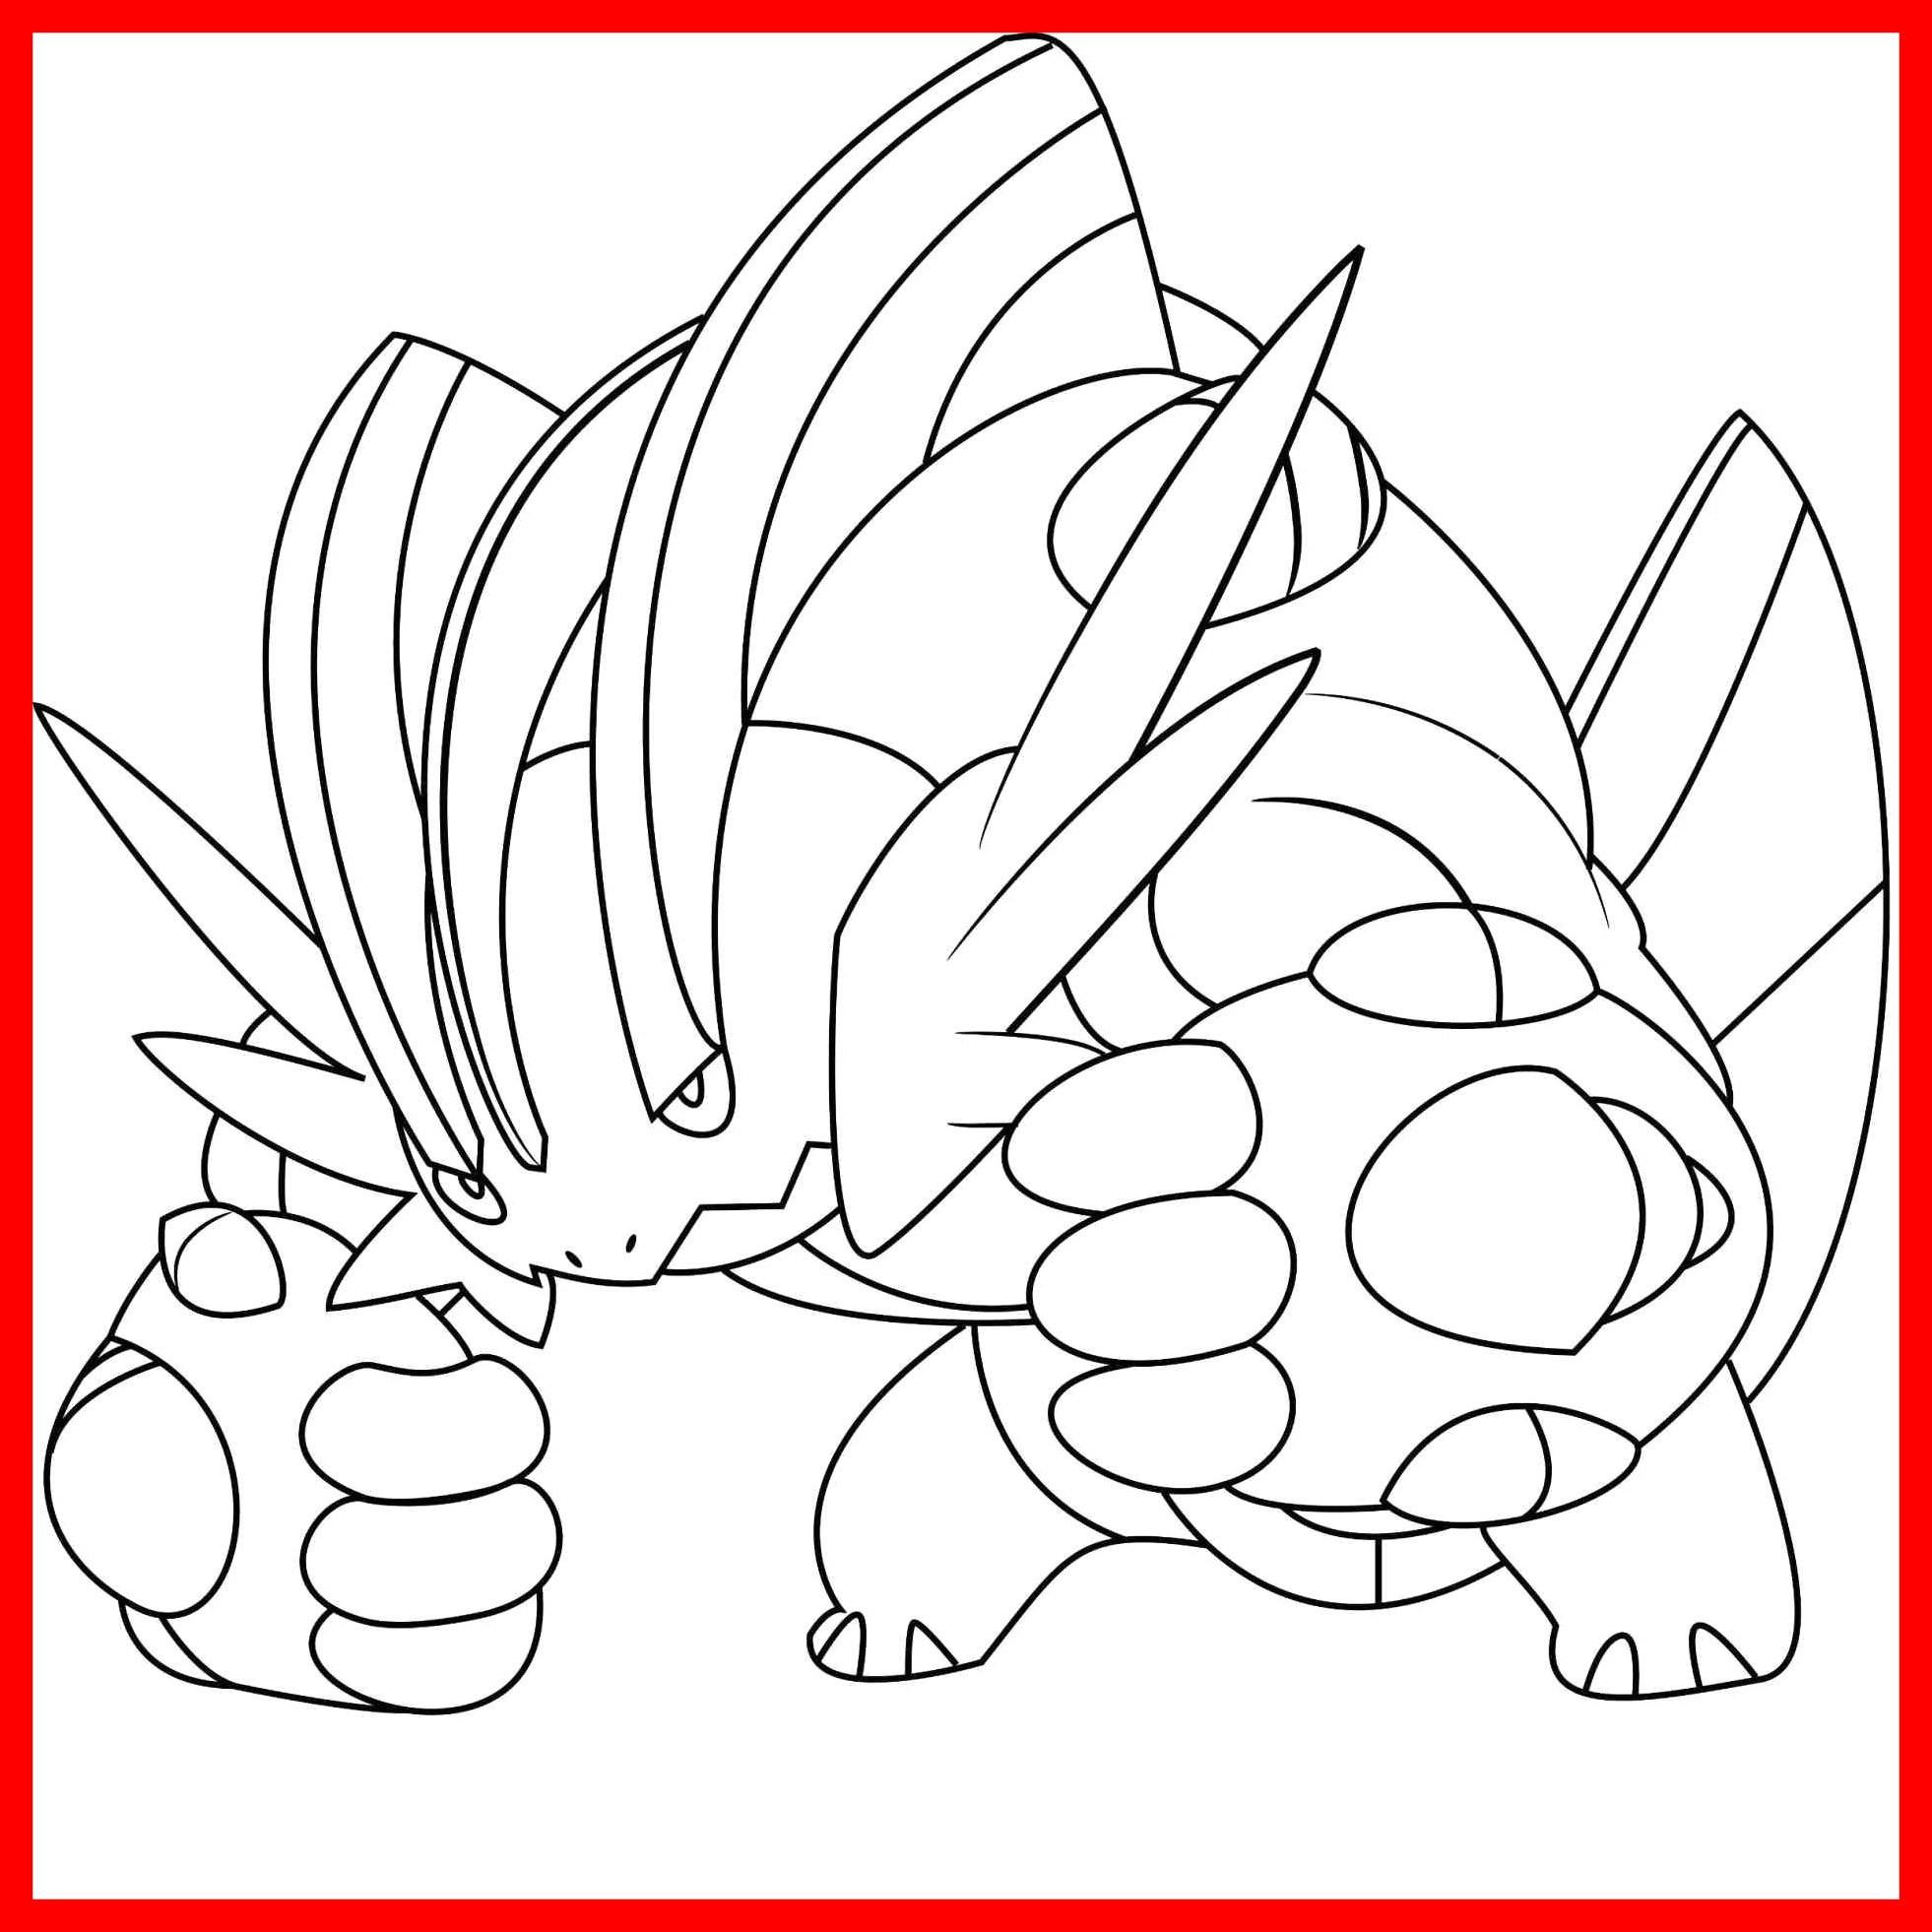 Ausmalbilder Pokemon Rayquaza Einzigartig Collection Pokemon Coloring Pages Kyogre Bilder